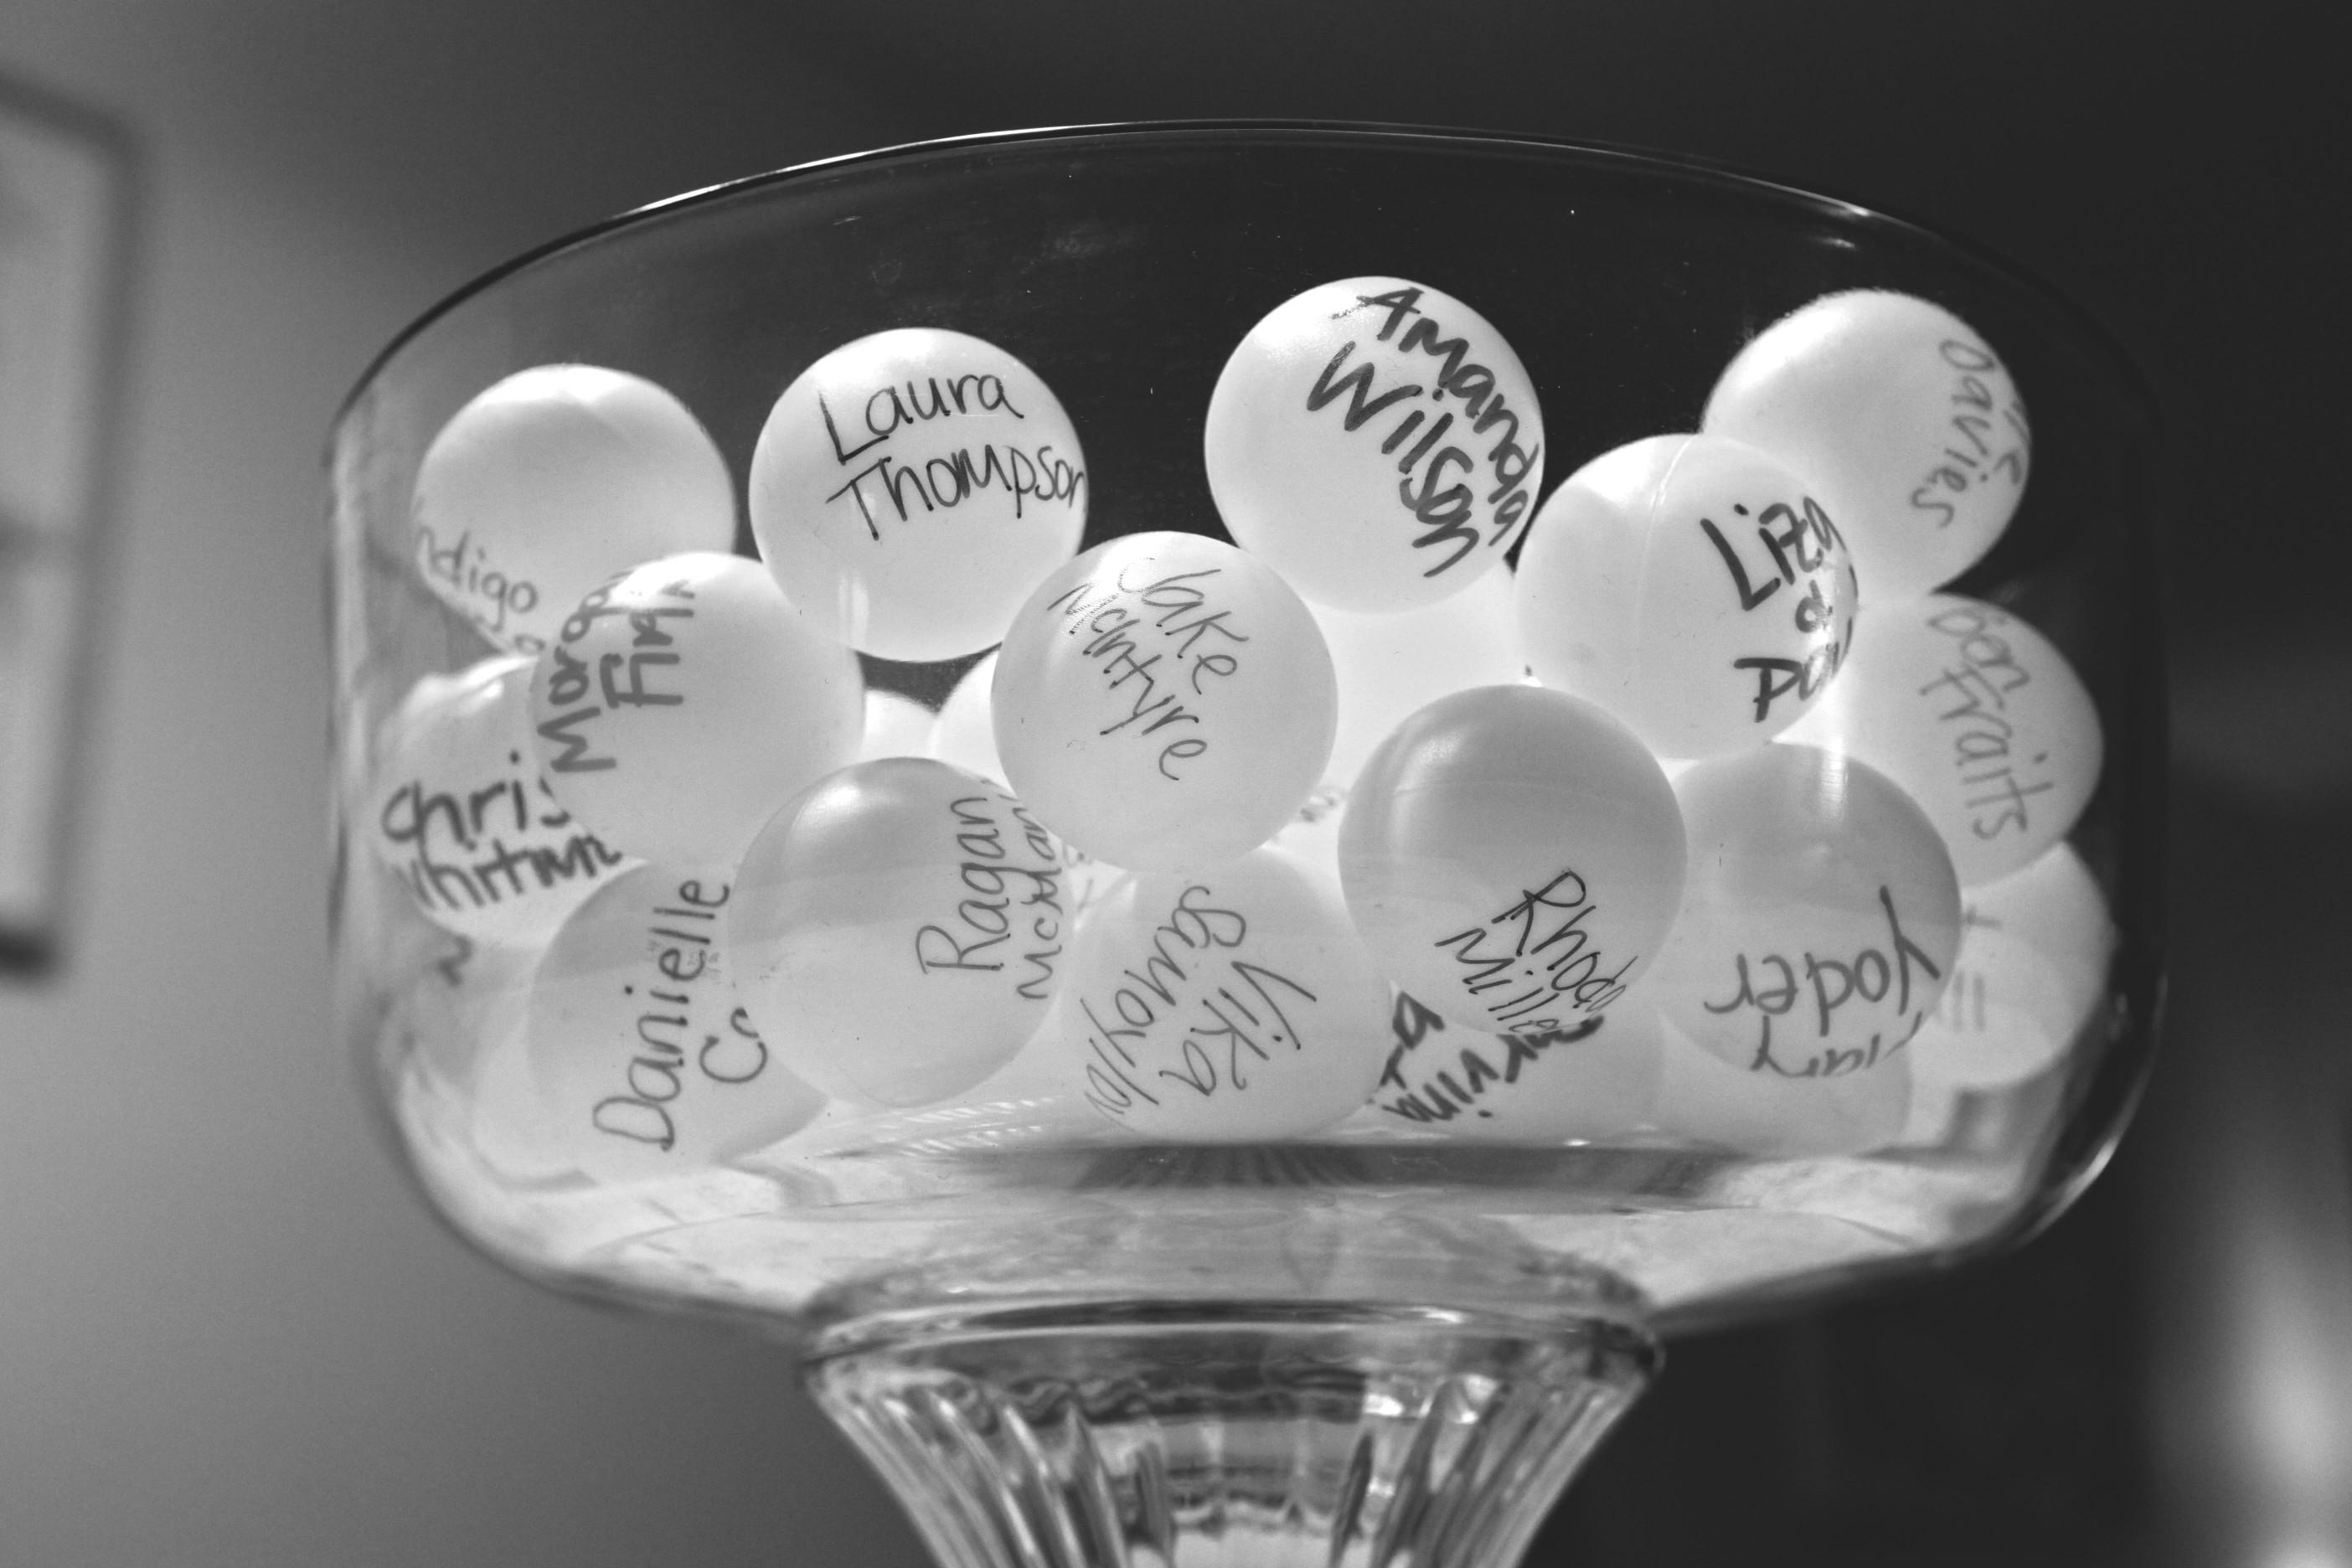 art lotto ballsbwweb